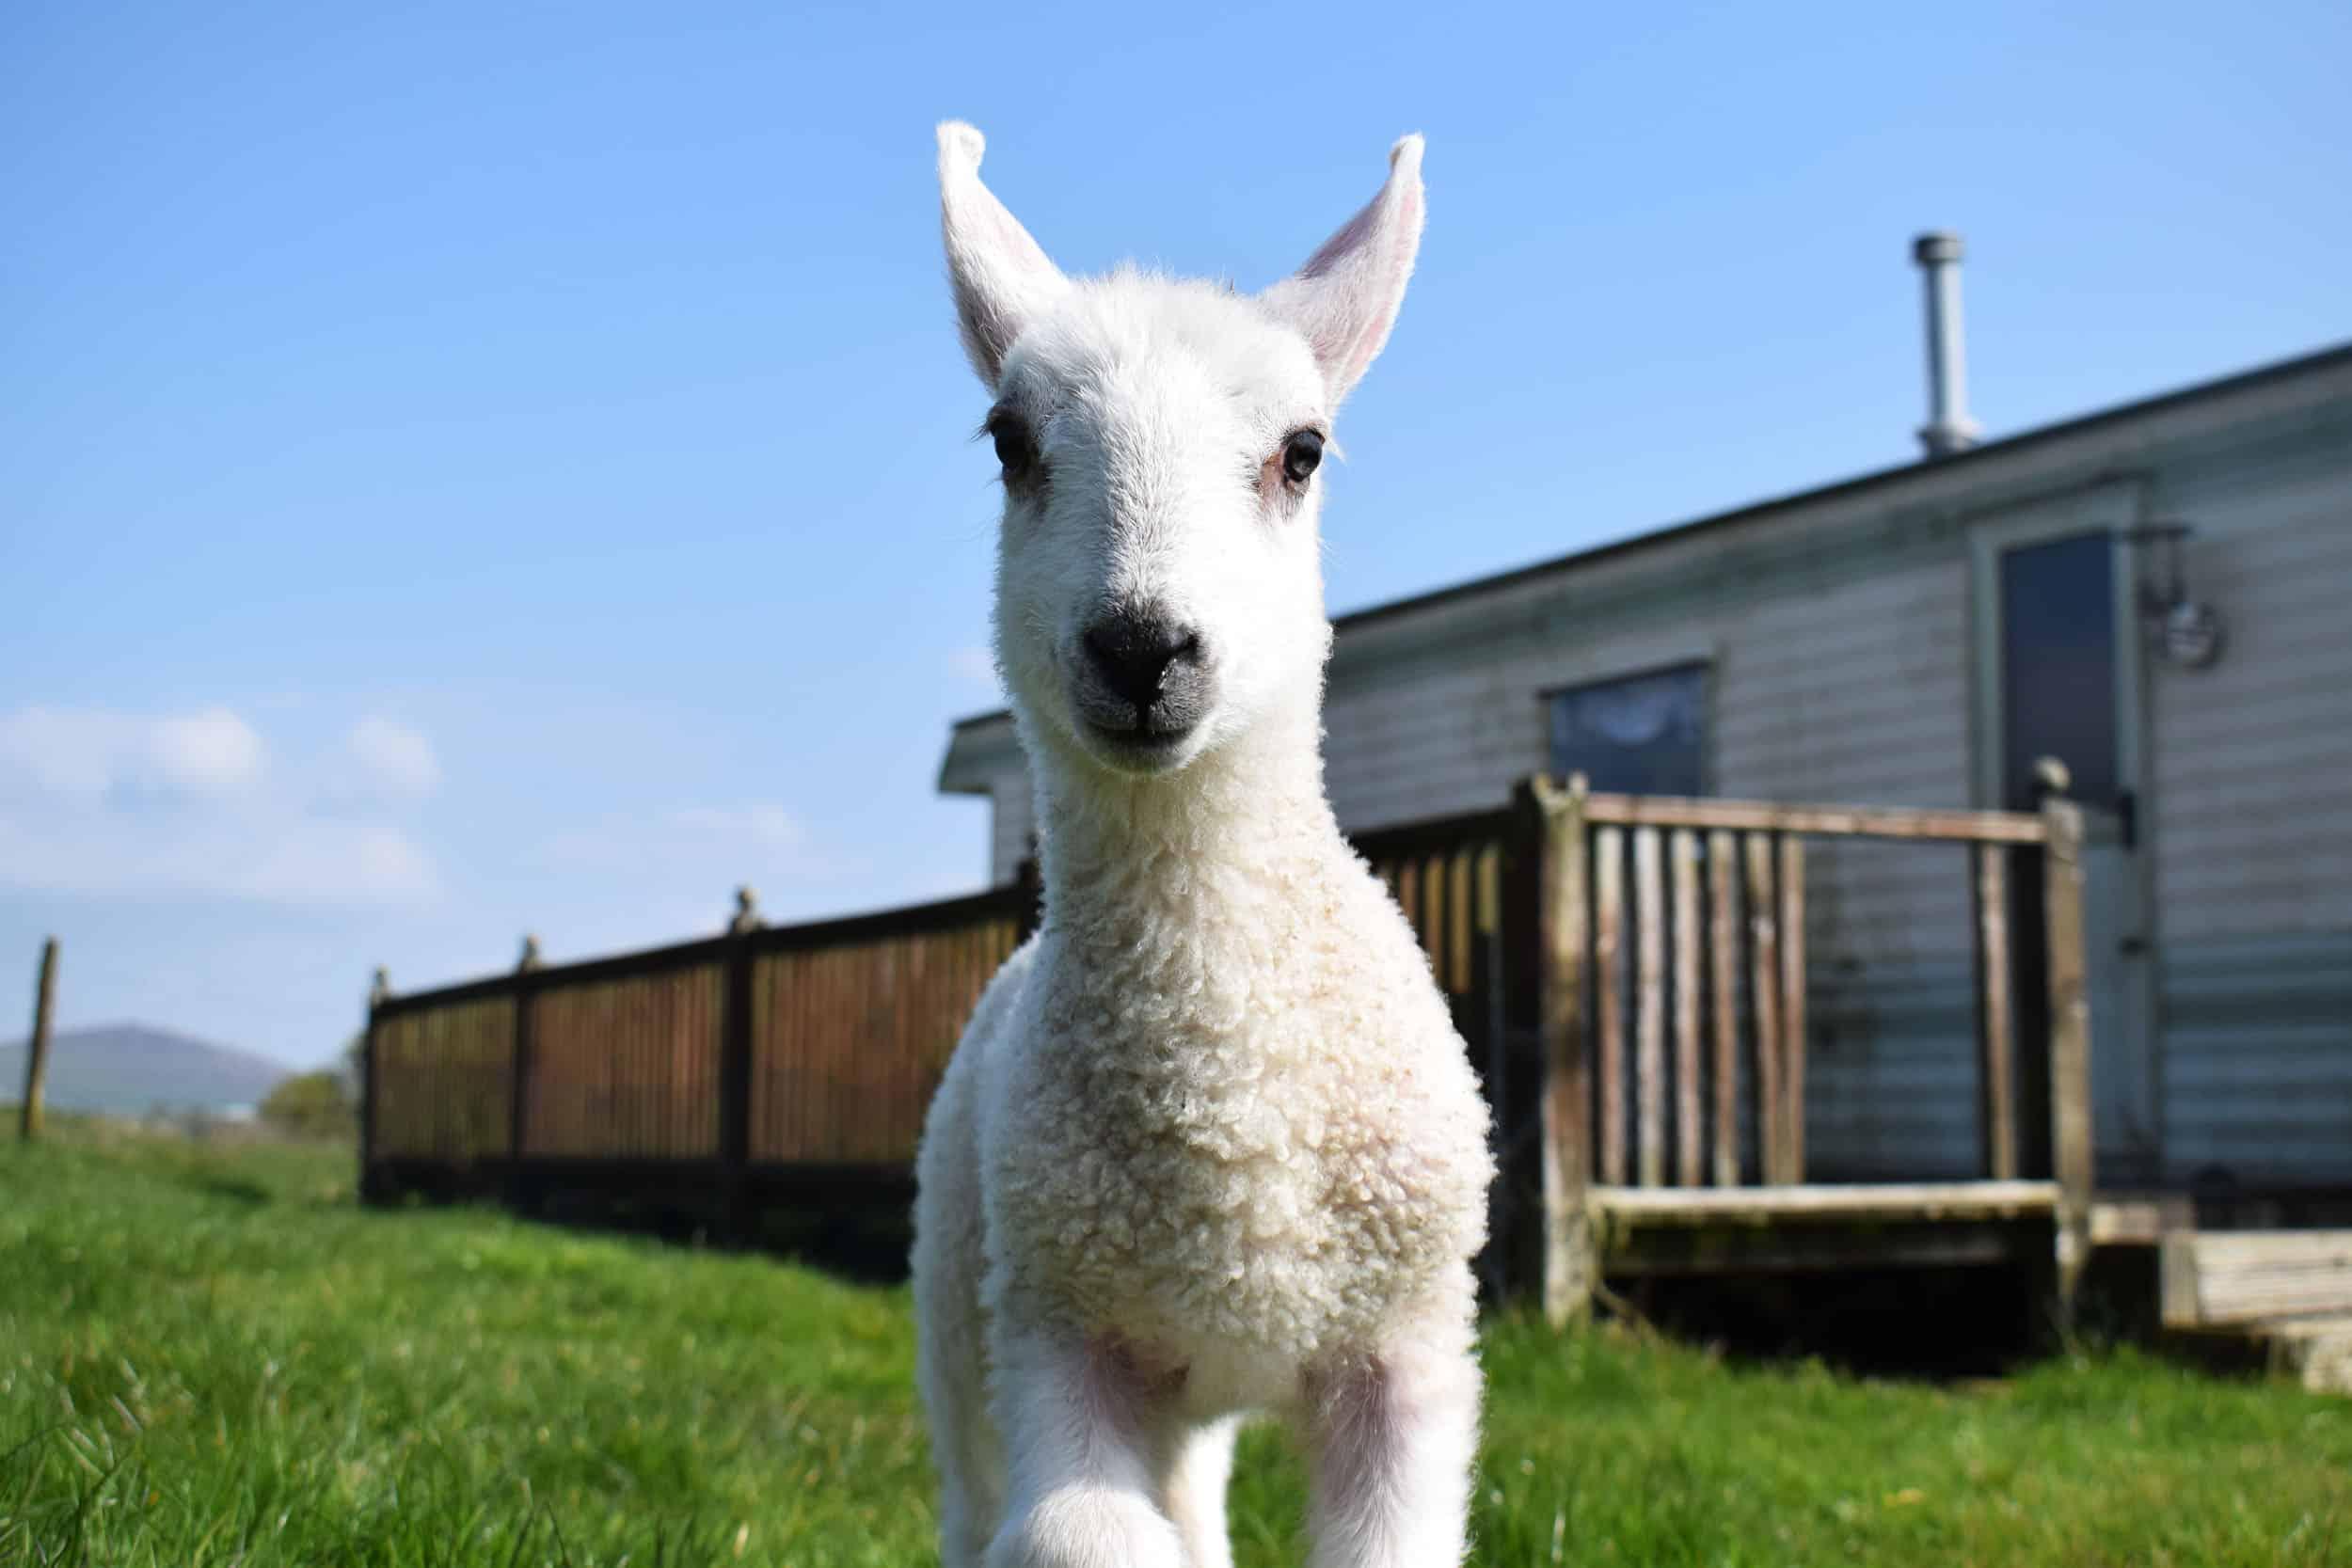 Lily sweet bfl blueface leicester sheep ewe lamb pet bottle baby lamb